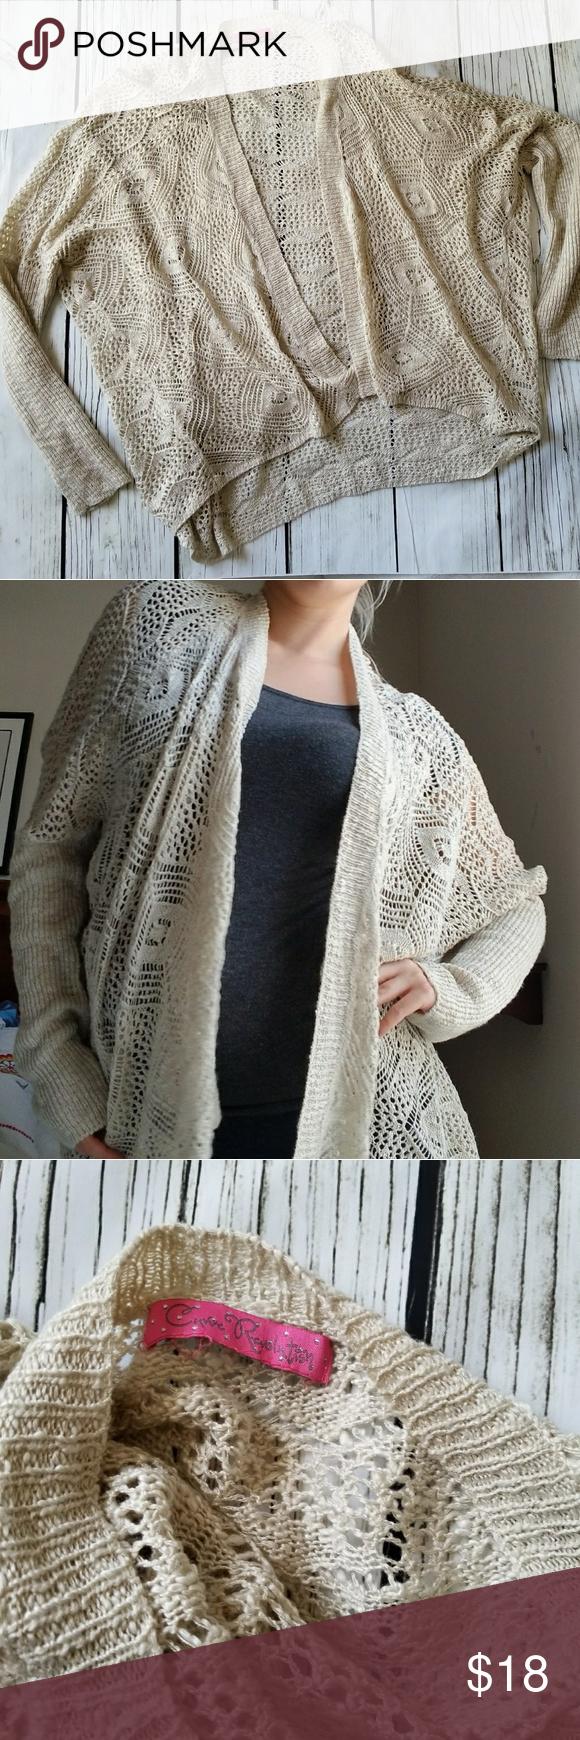 Oversized crochet cardigan shrug sweater beige | Shrug sweater ...